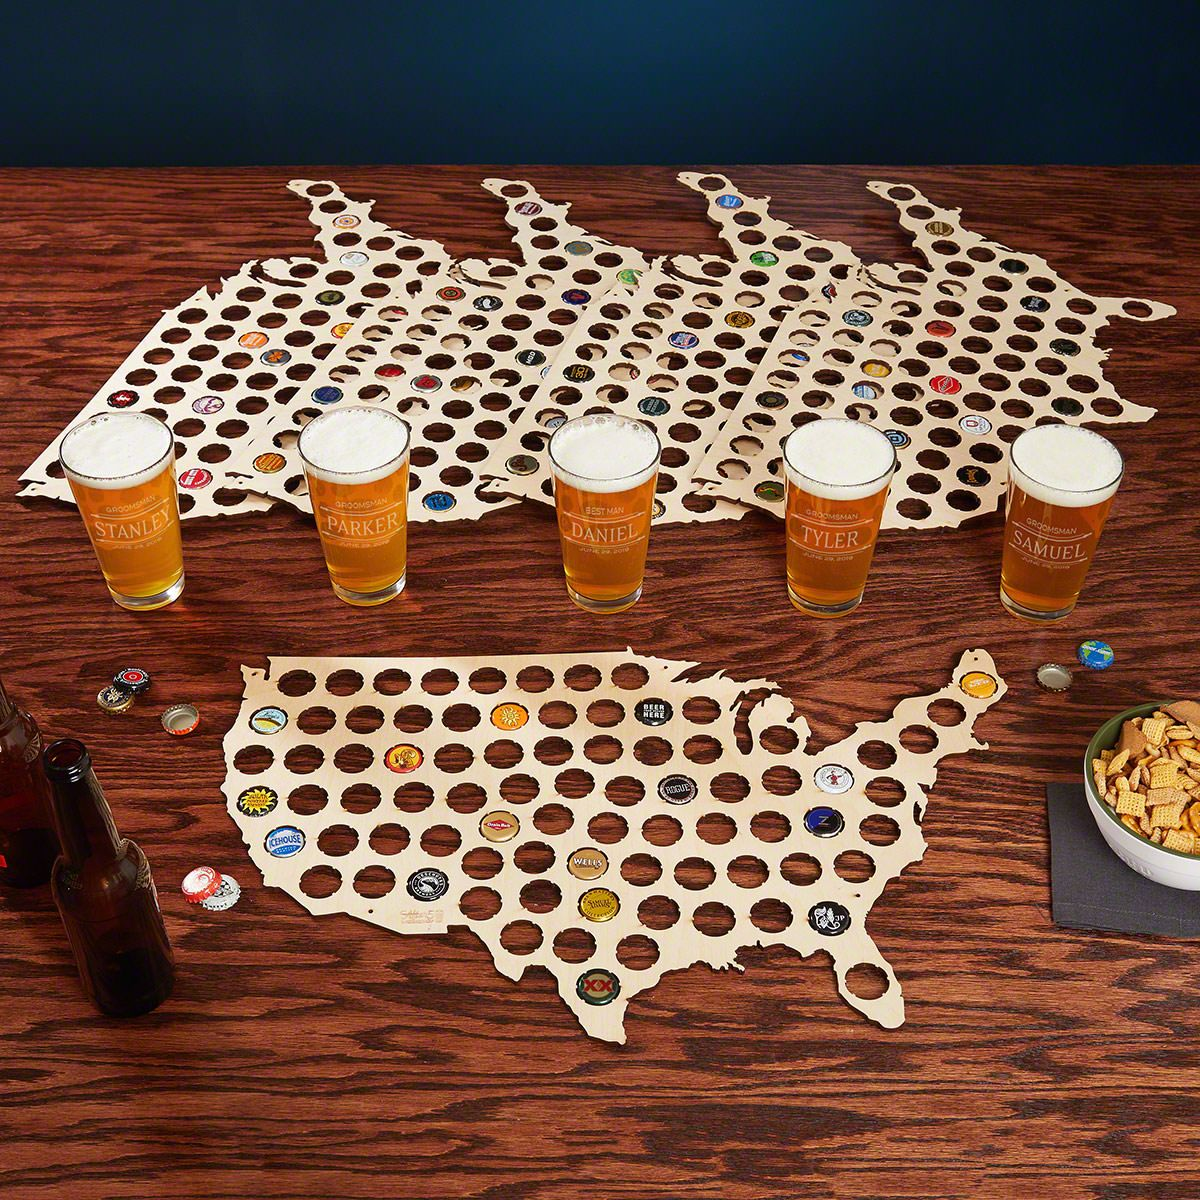 Stanford Custom Pint Glasses & Beer Cap Maps – Set of 5 Gifts for Groomsmen